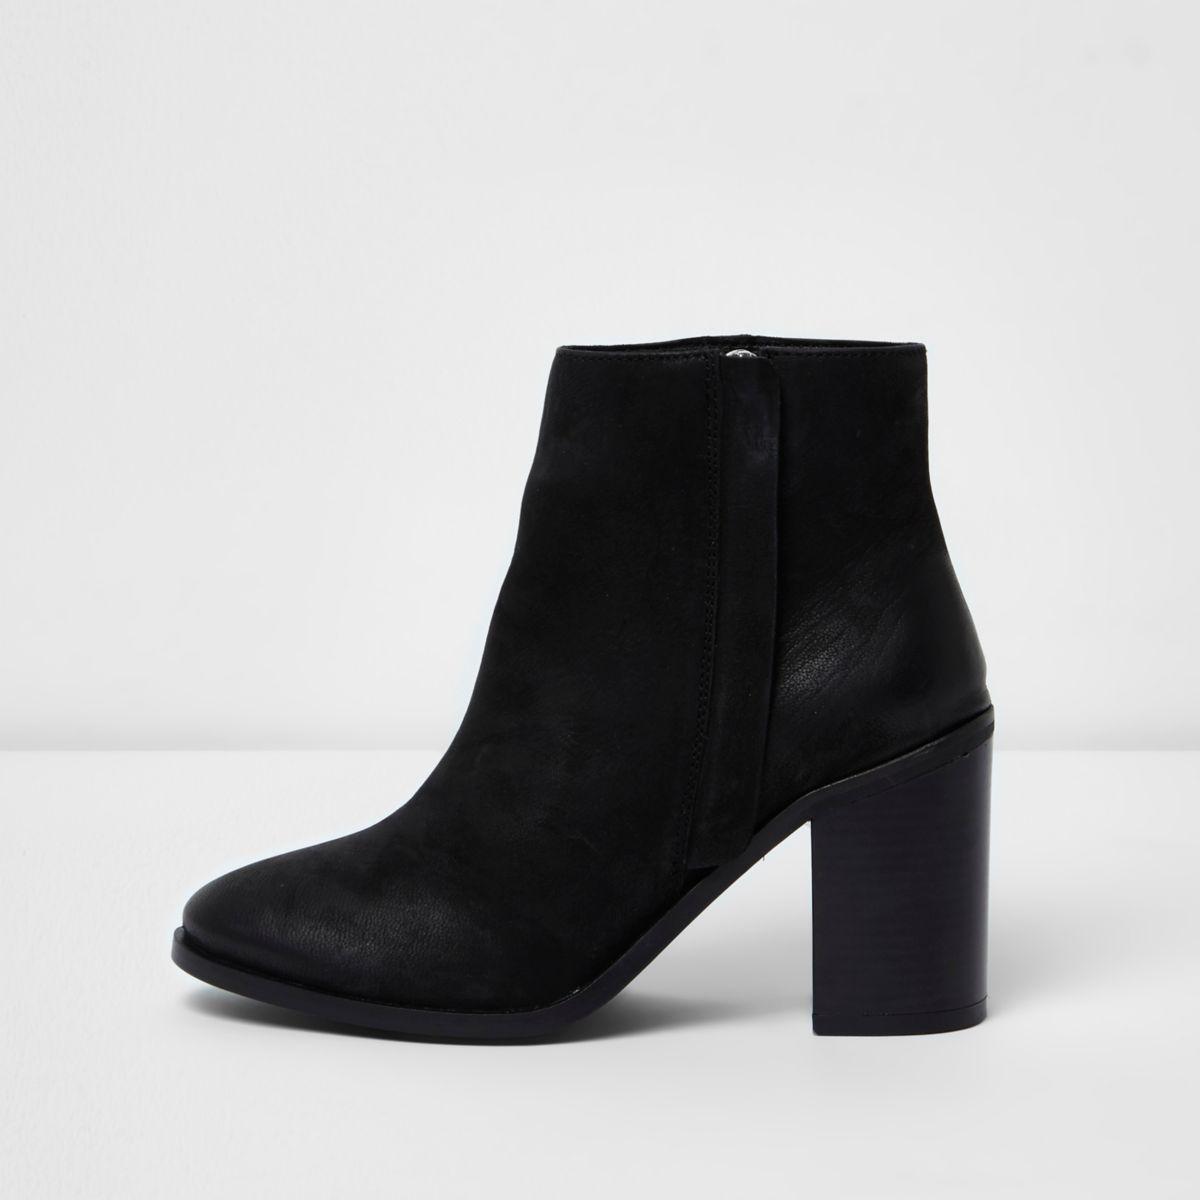 Black leather zip up block heel ankle boots